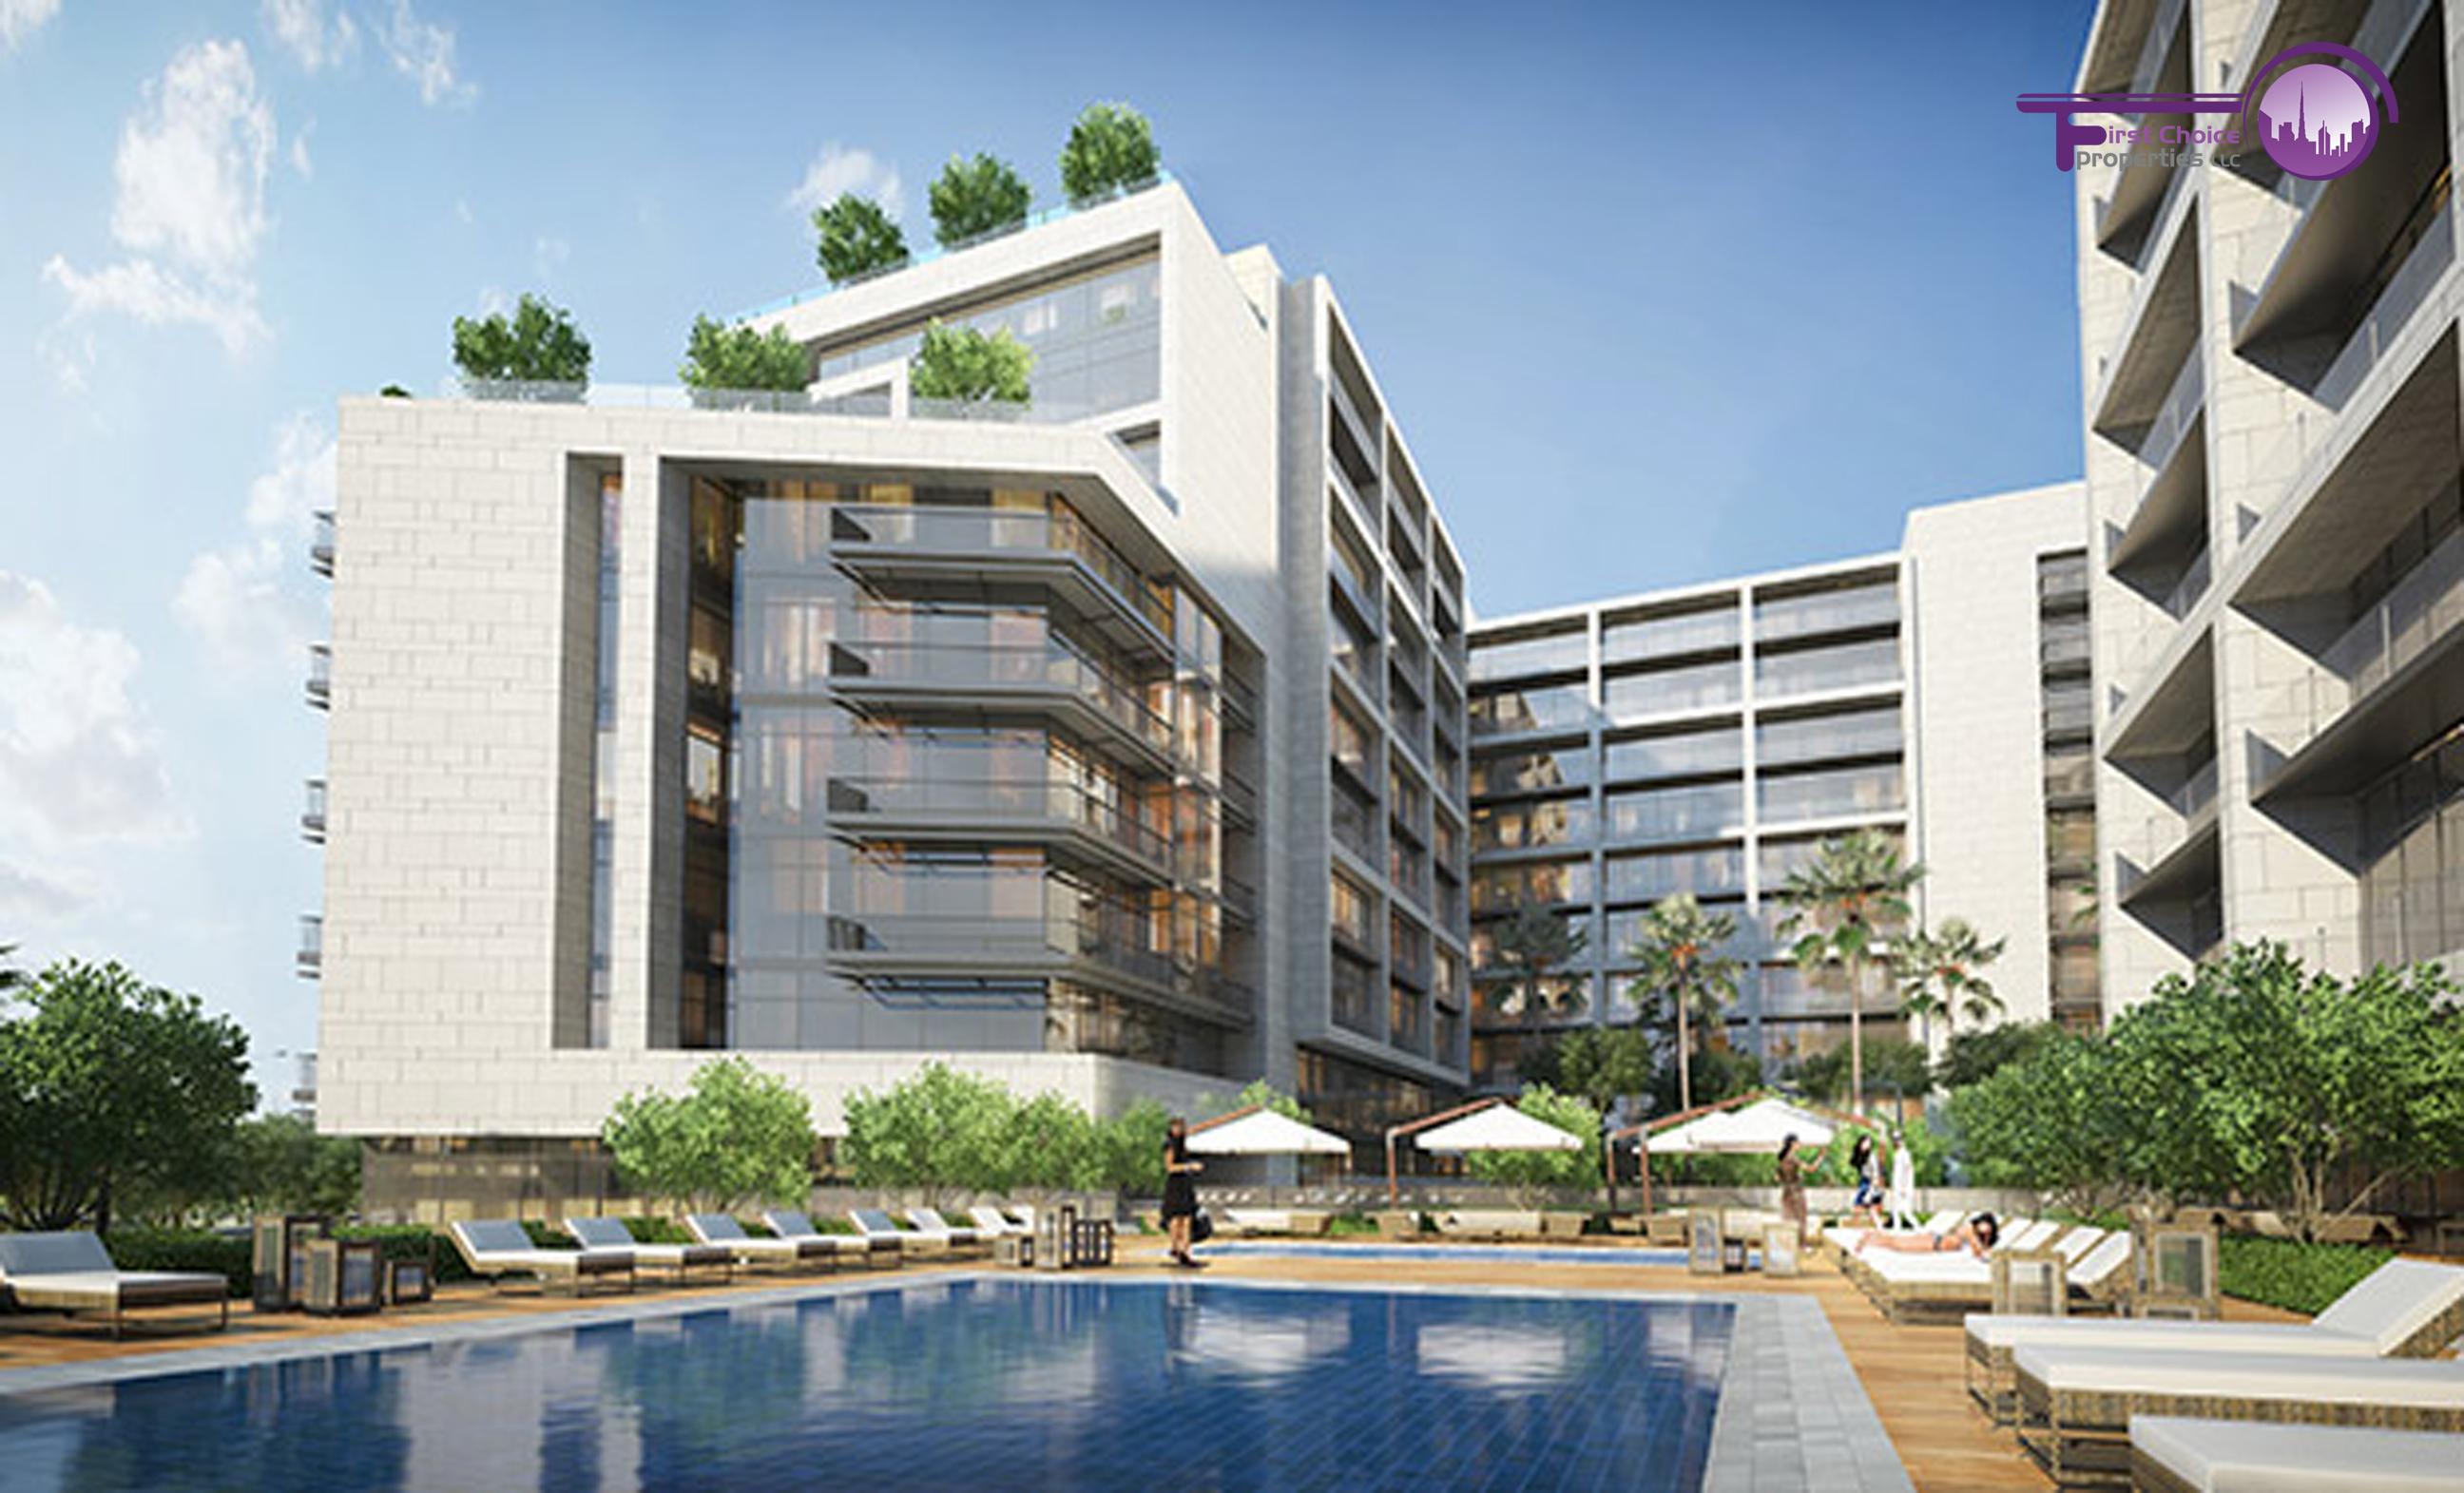 Studio - 1BR - 2BR - 3BR - 4BR Apartment  - Abu Dhabi - UAE - Saadiyat Island - Soho Square Residences (3).jpg